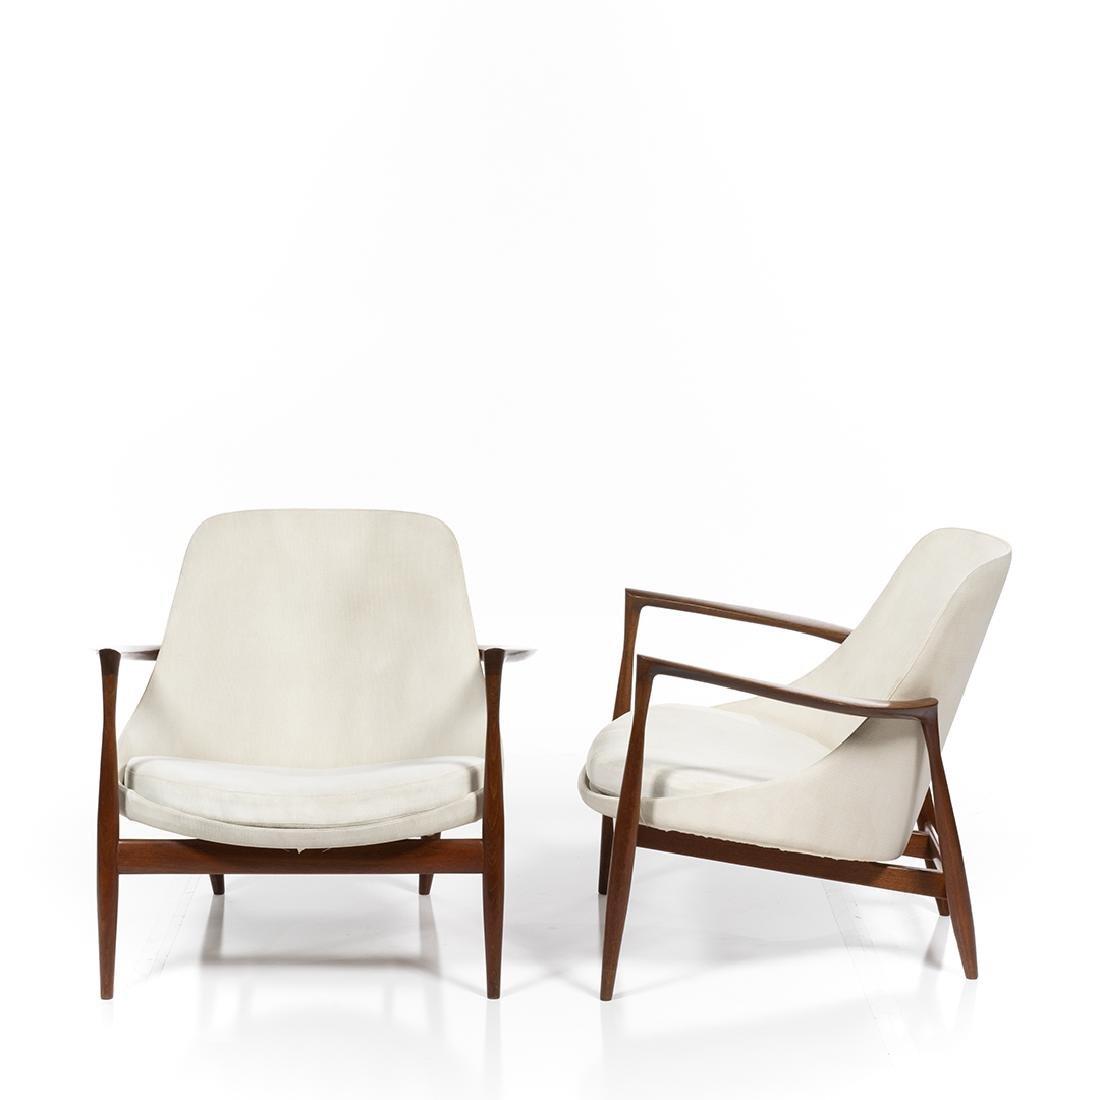 IB Kofod Larsen Elizabeth Chairs - 3